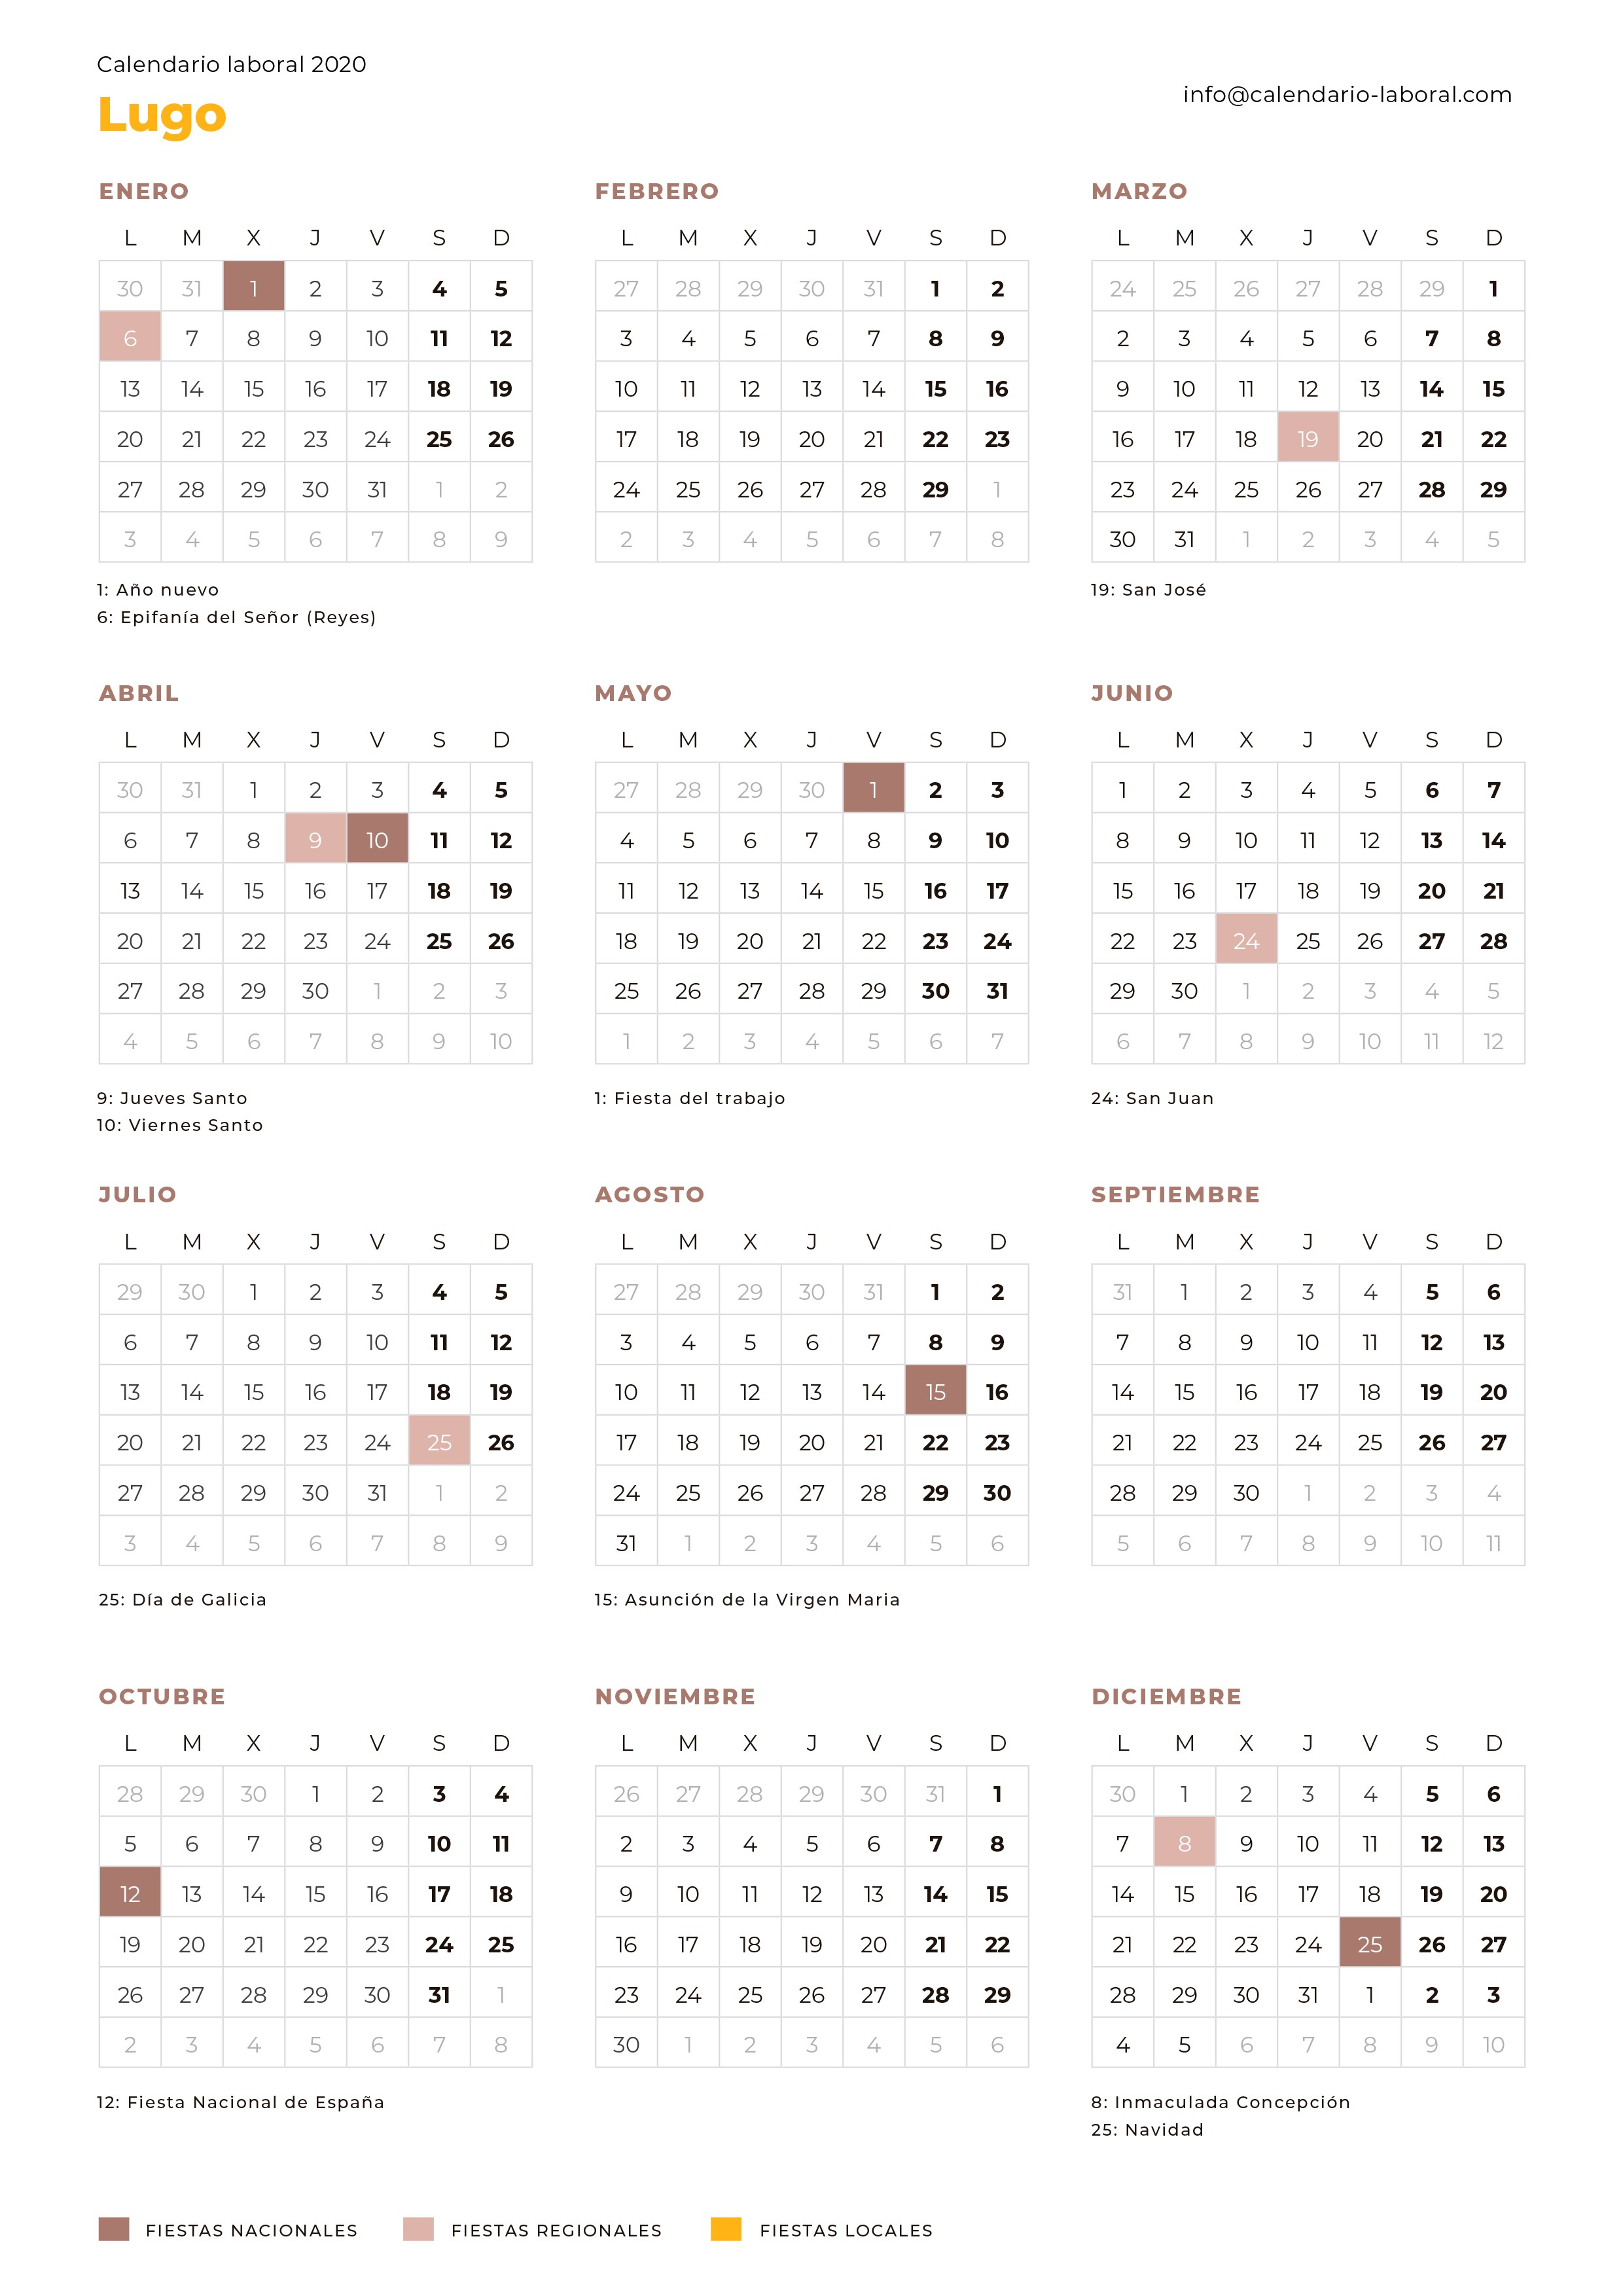 calendario laboral lugo 2020